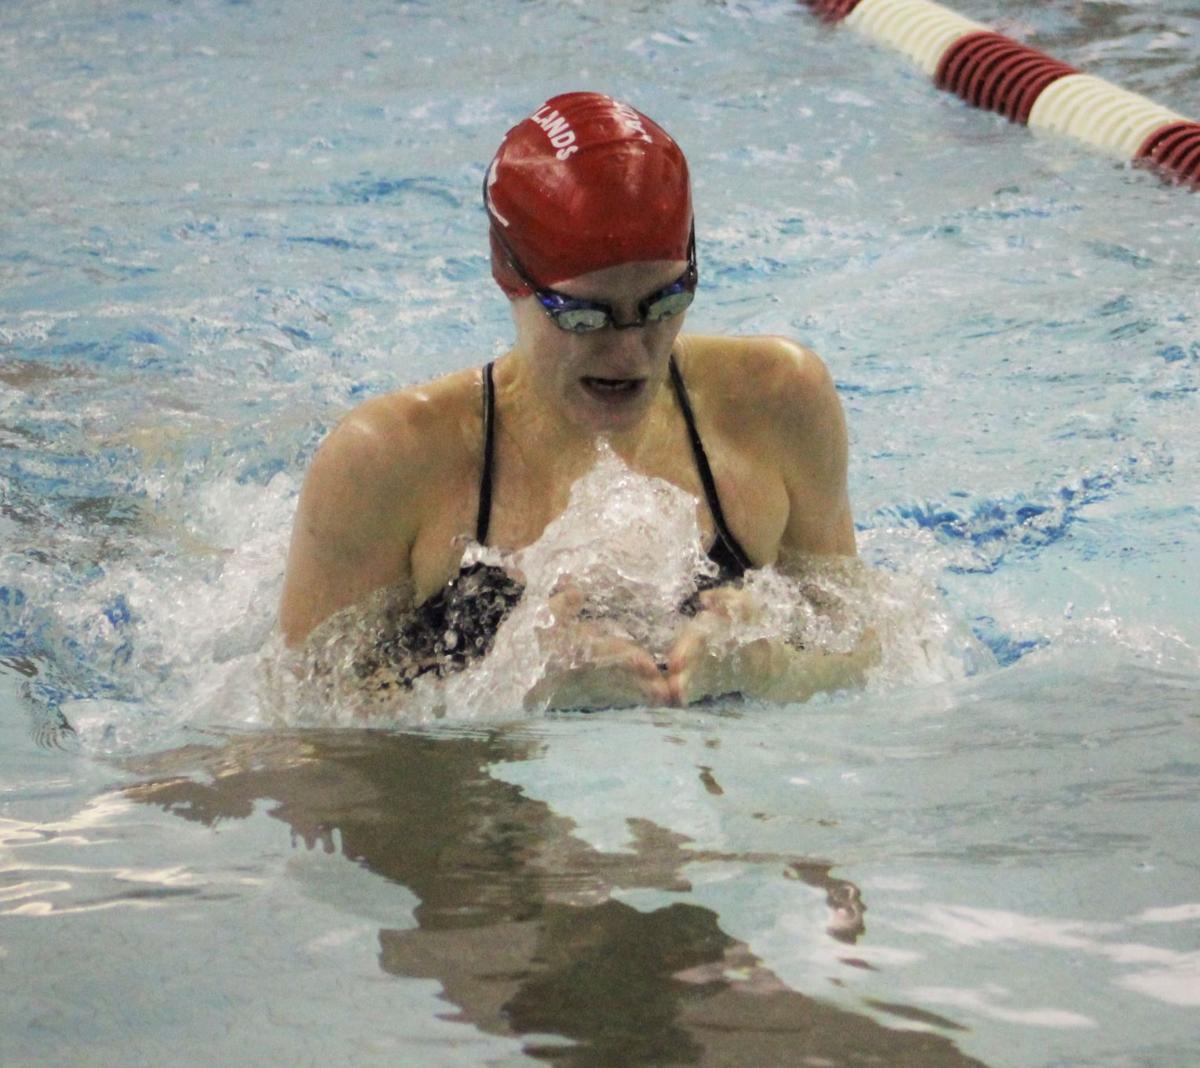 Thomas swims the breaststroke leg